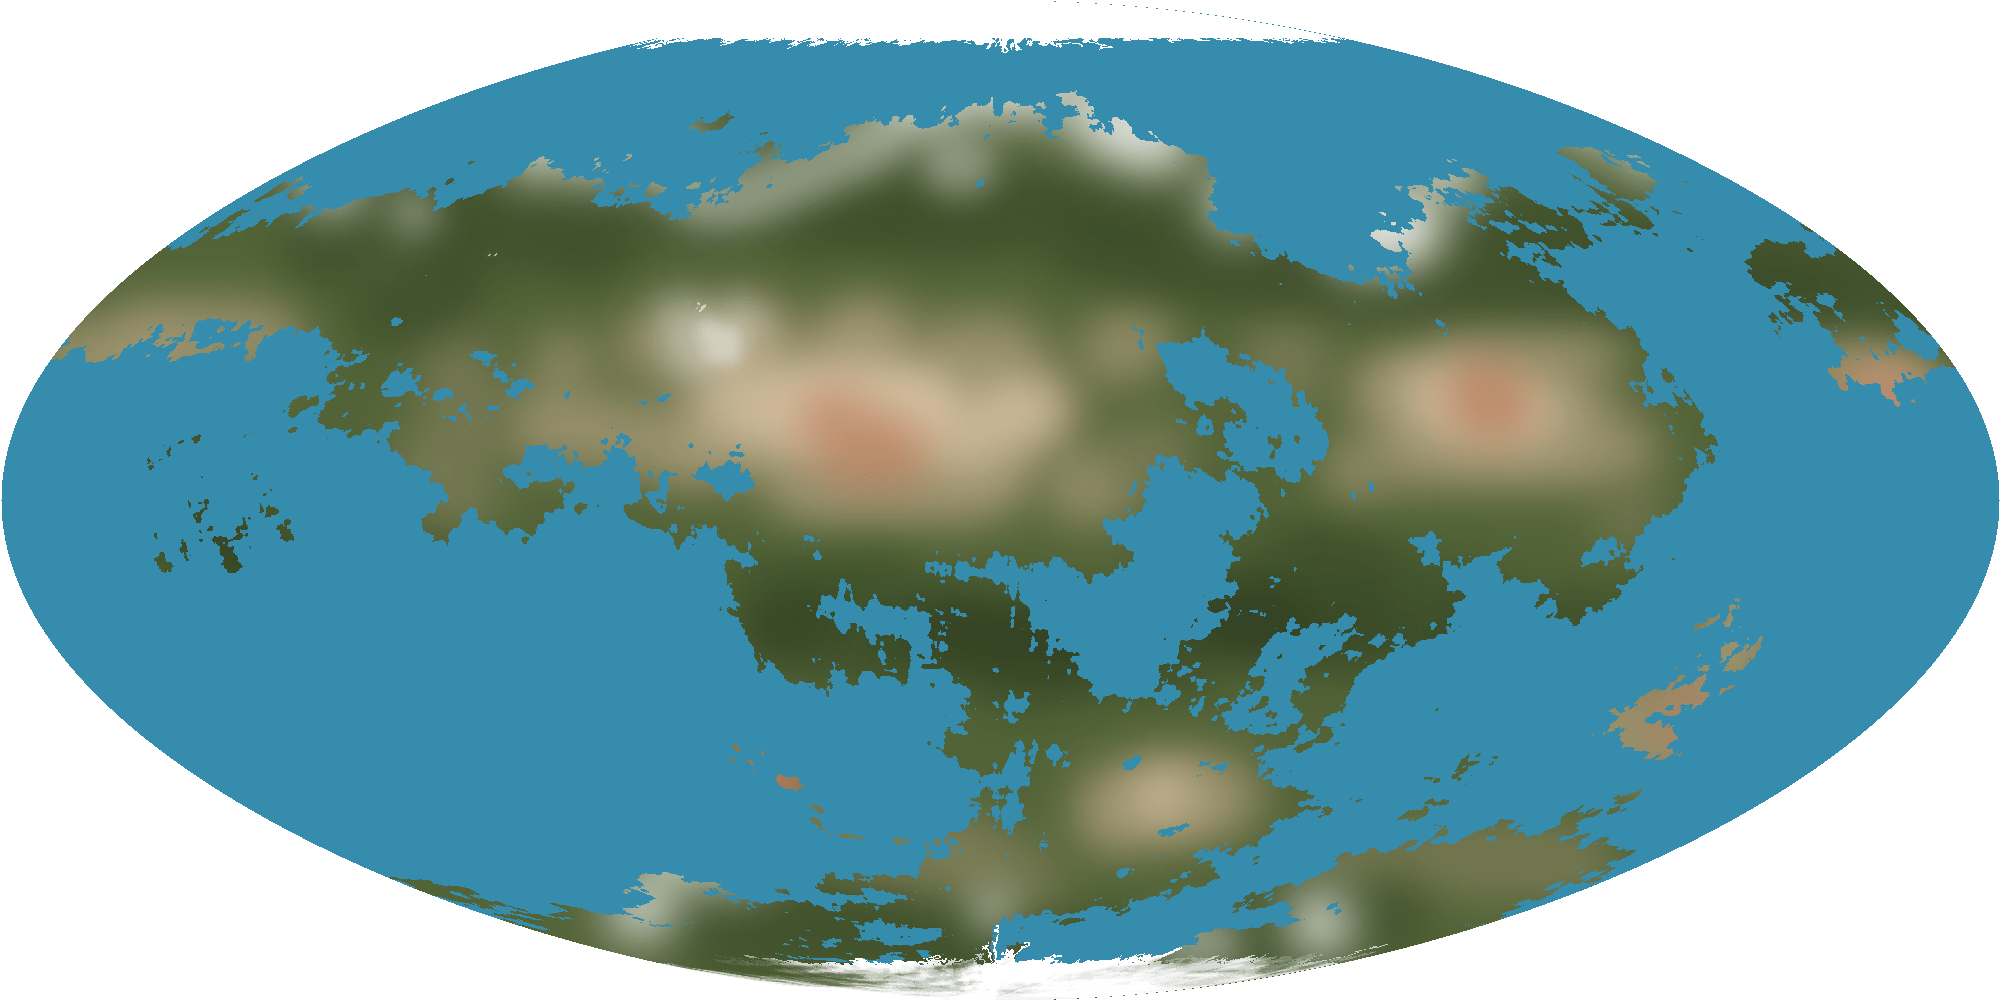 Elonth Worldbuilding